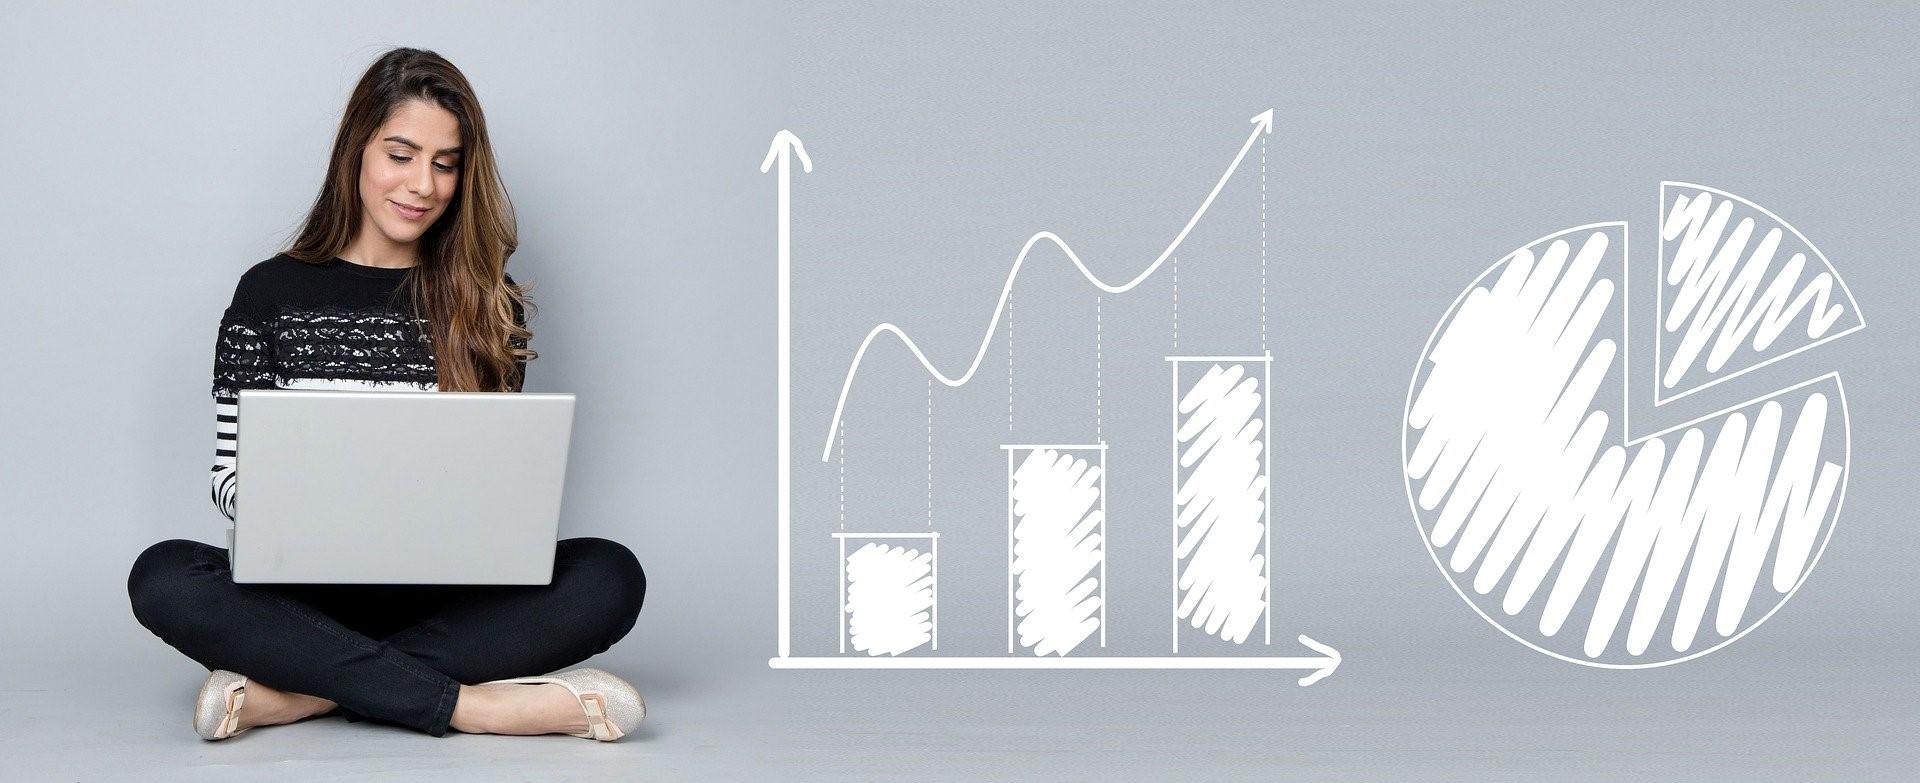 bolsa-de-valores-xp-investimentos